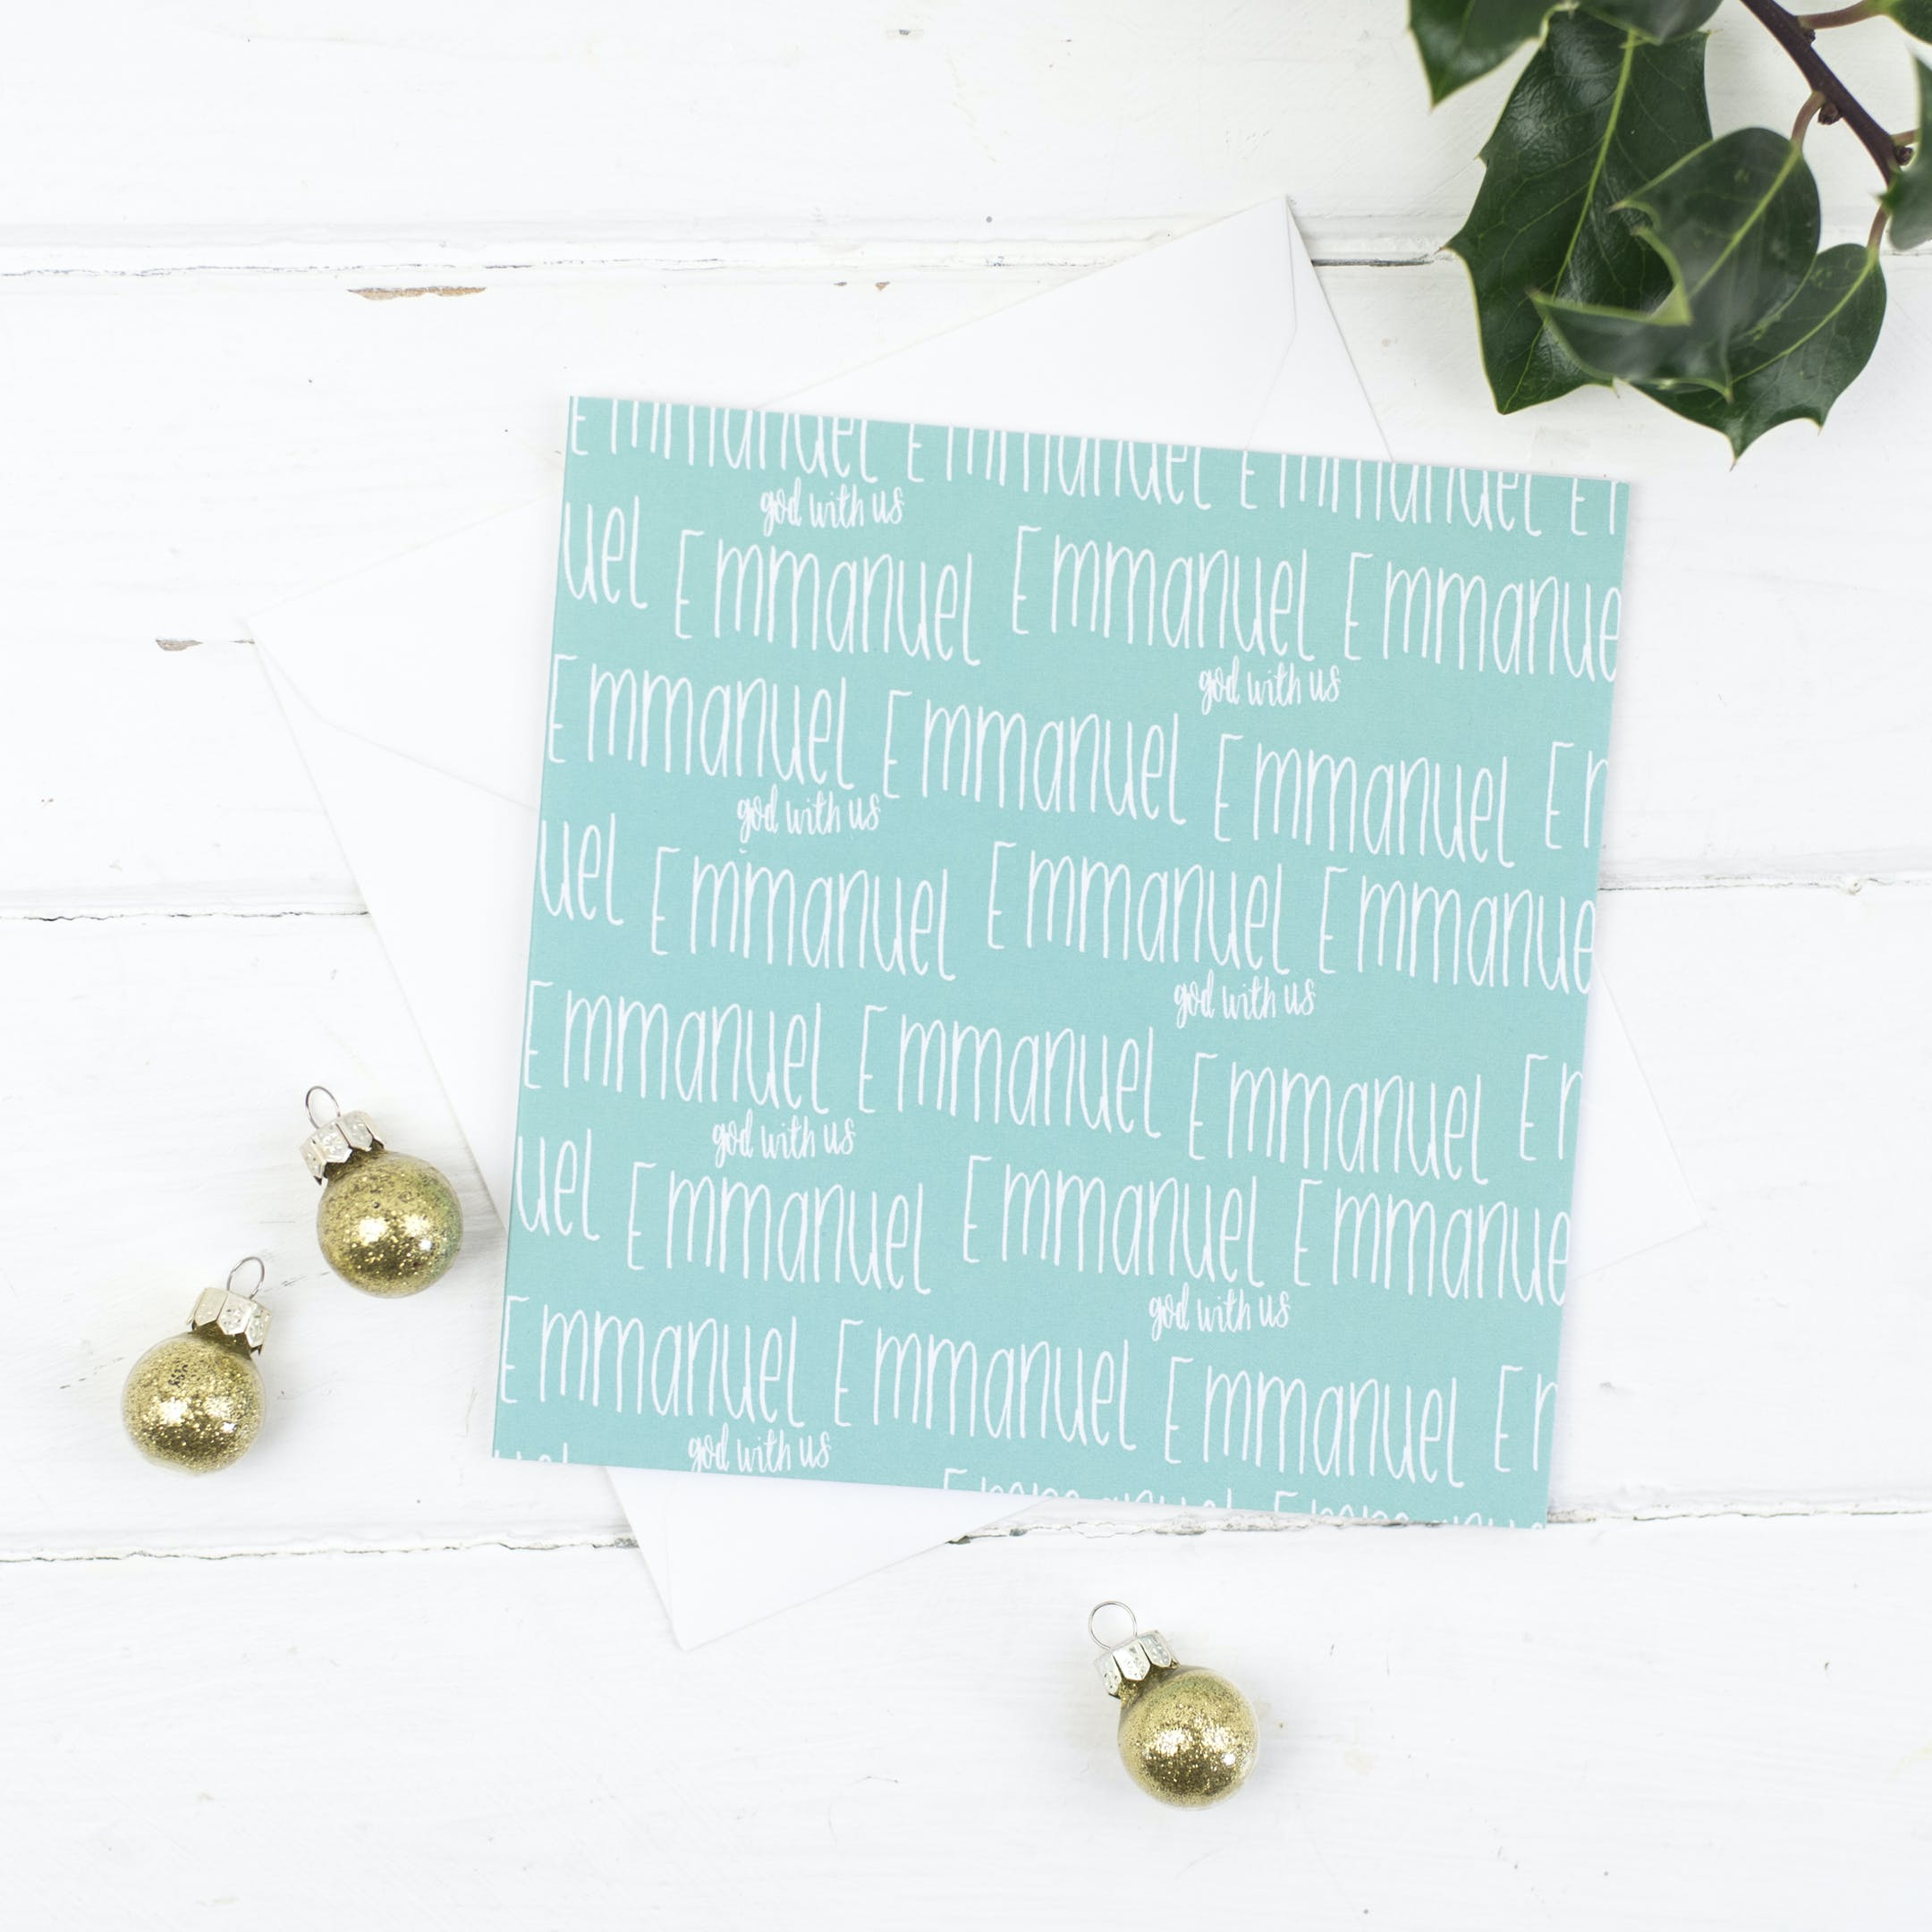 Emmanuel - Christmas Card - Christian Lettering Company